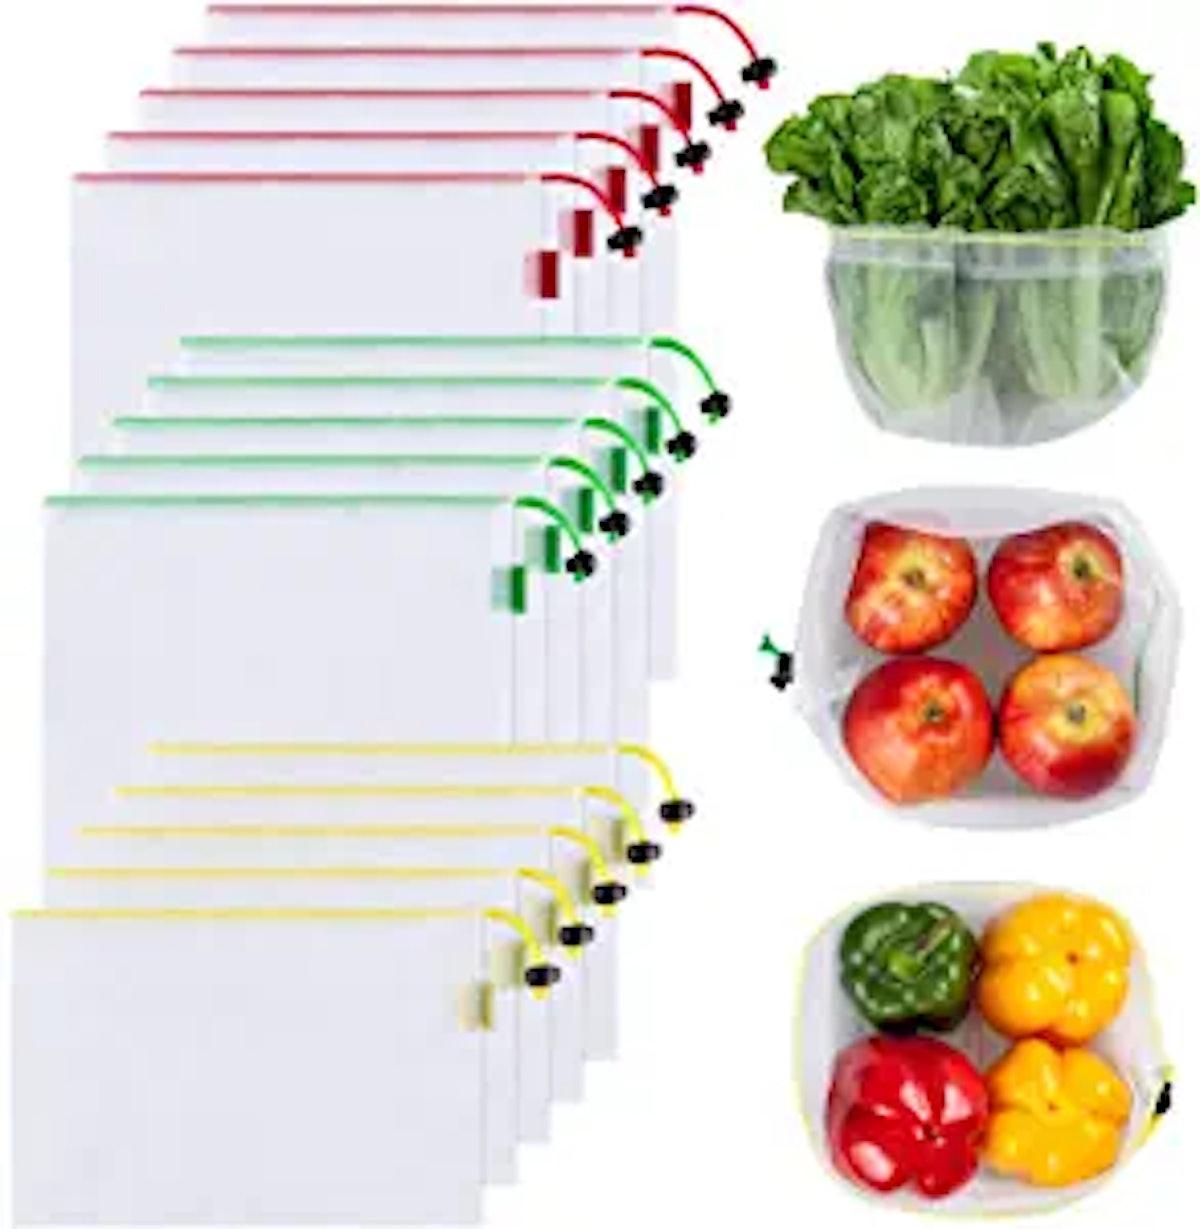 Ecowaare Reusable Mesh Produce Bags (15 pieces)